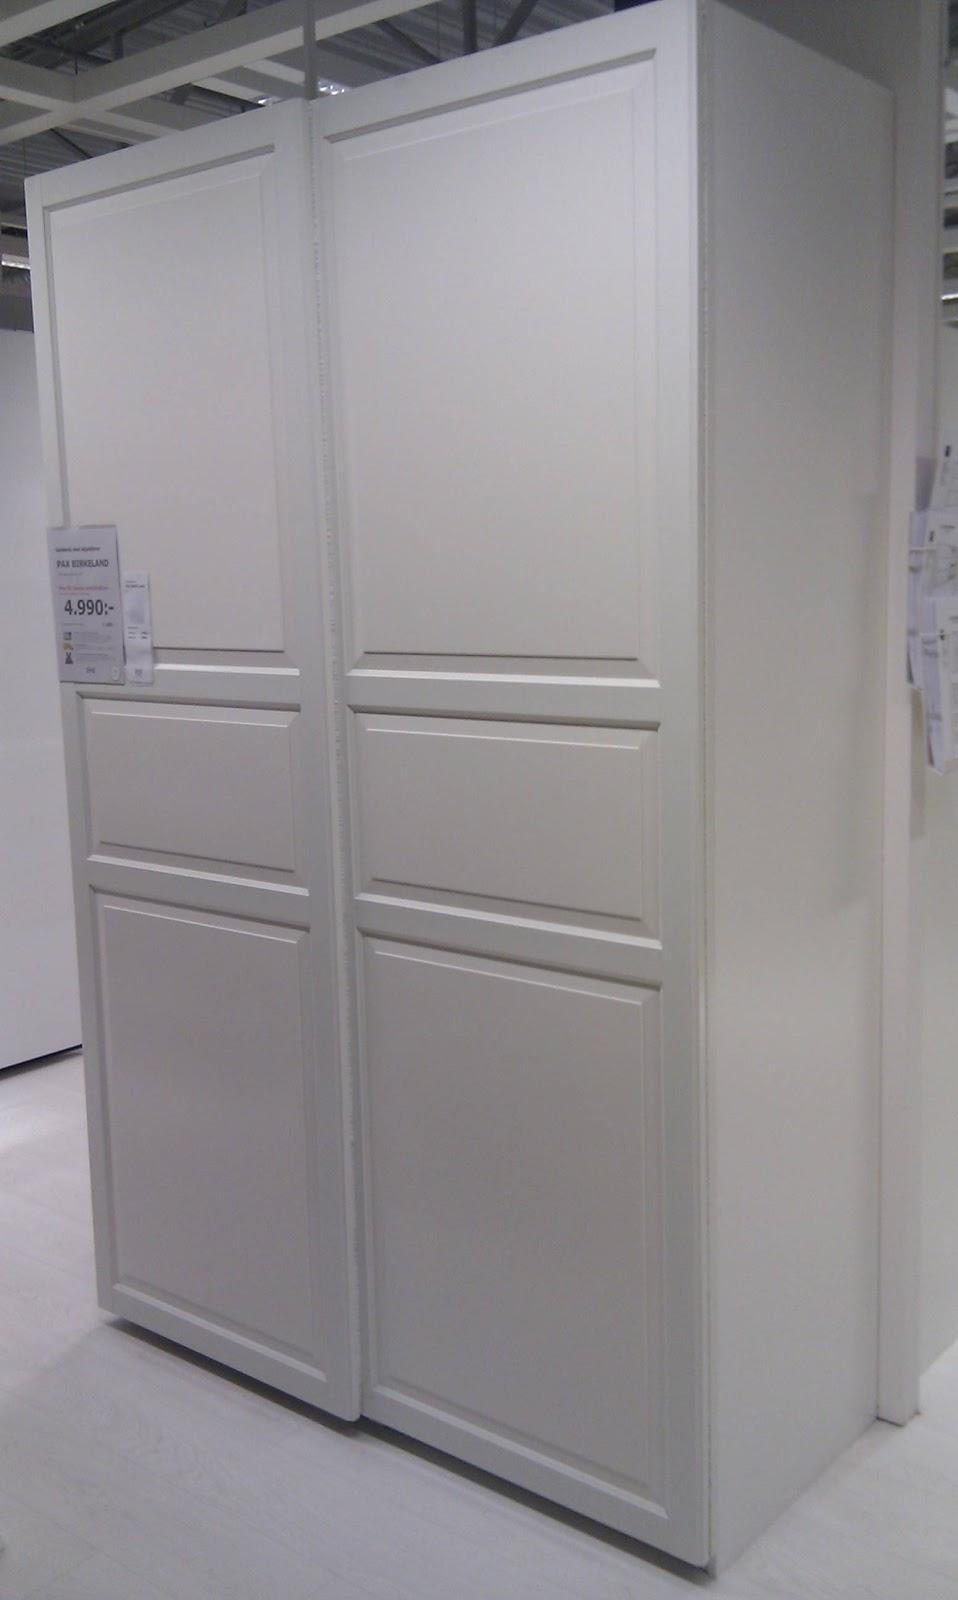 Erikslundsgatan: garderober sovrum 1 & tvättstuga